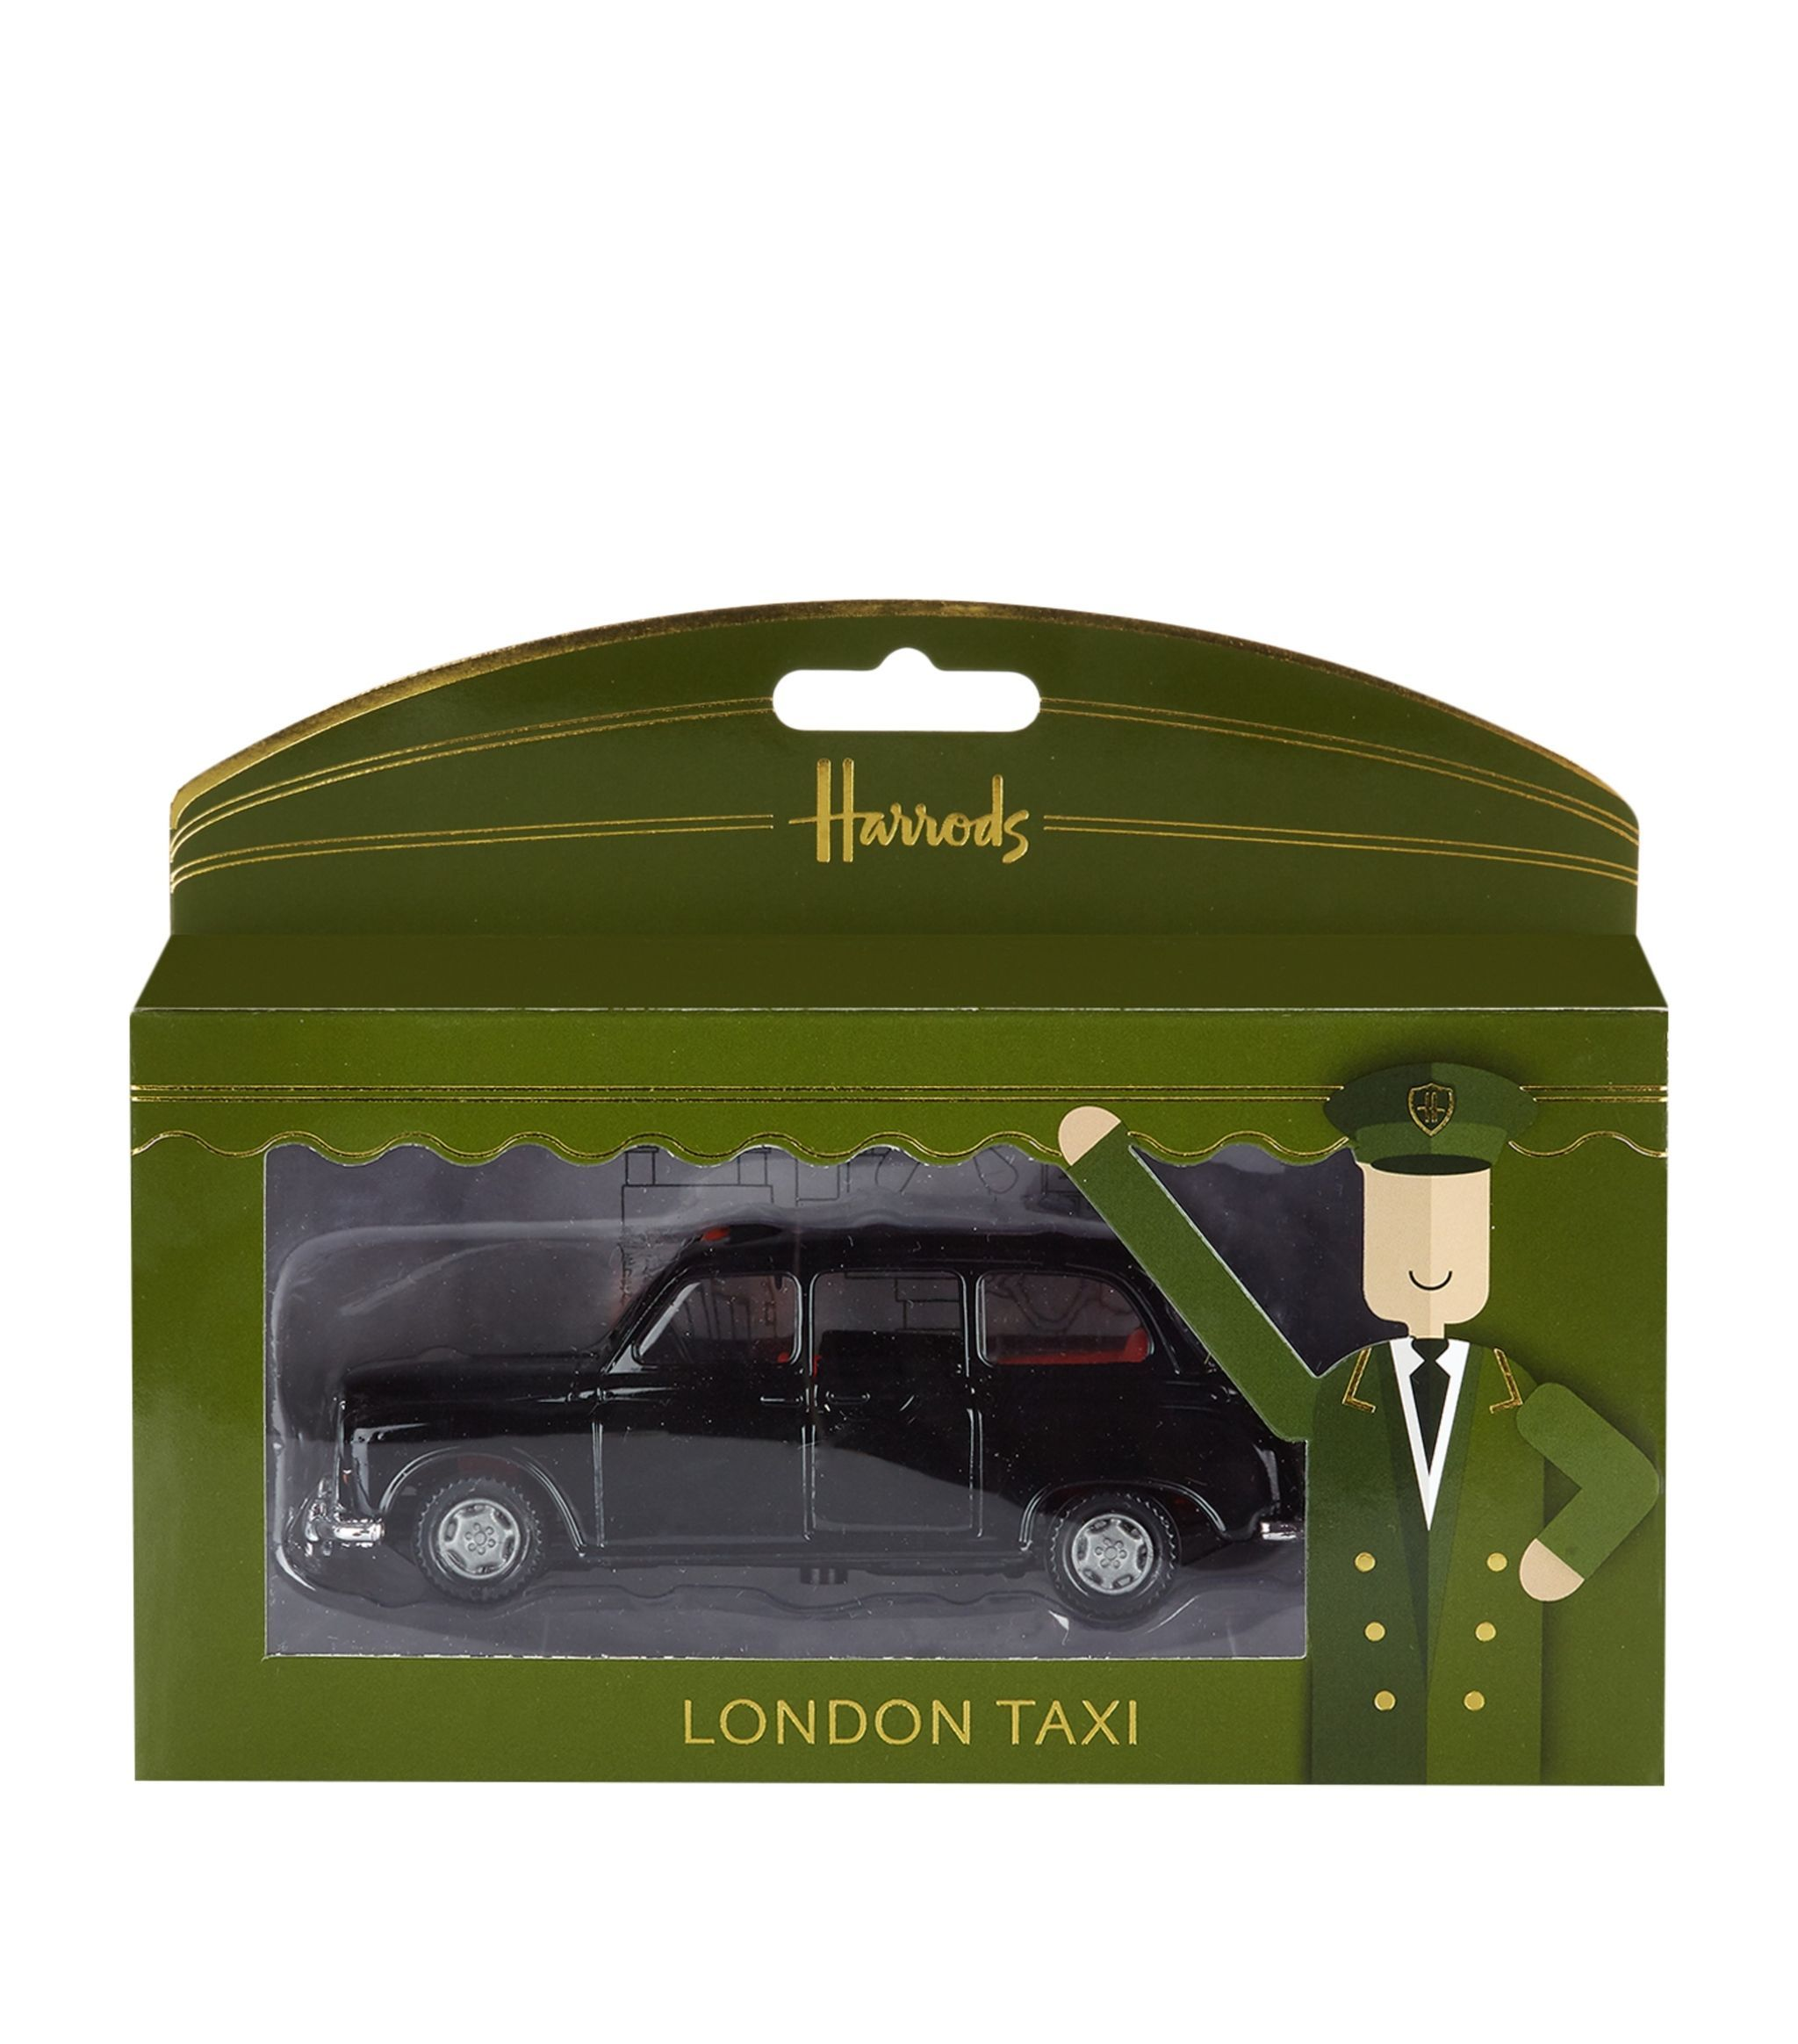 Harrods London Taxi #AD , #ad, #Harrods, #London, #Taxi